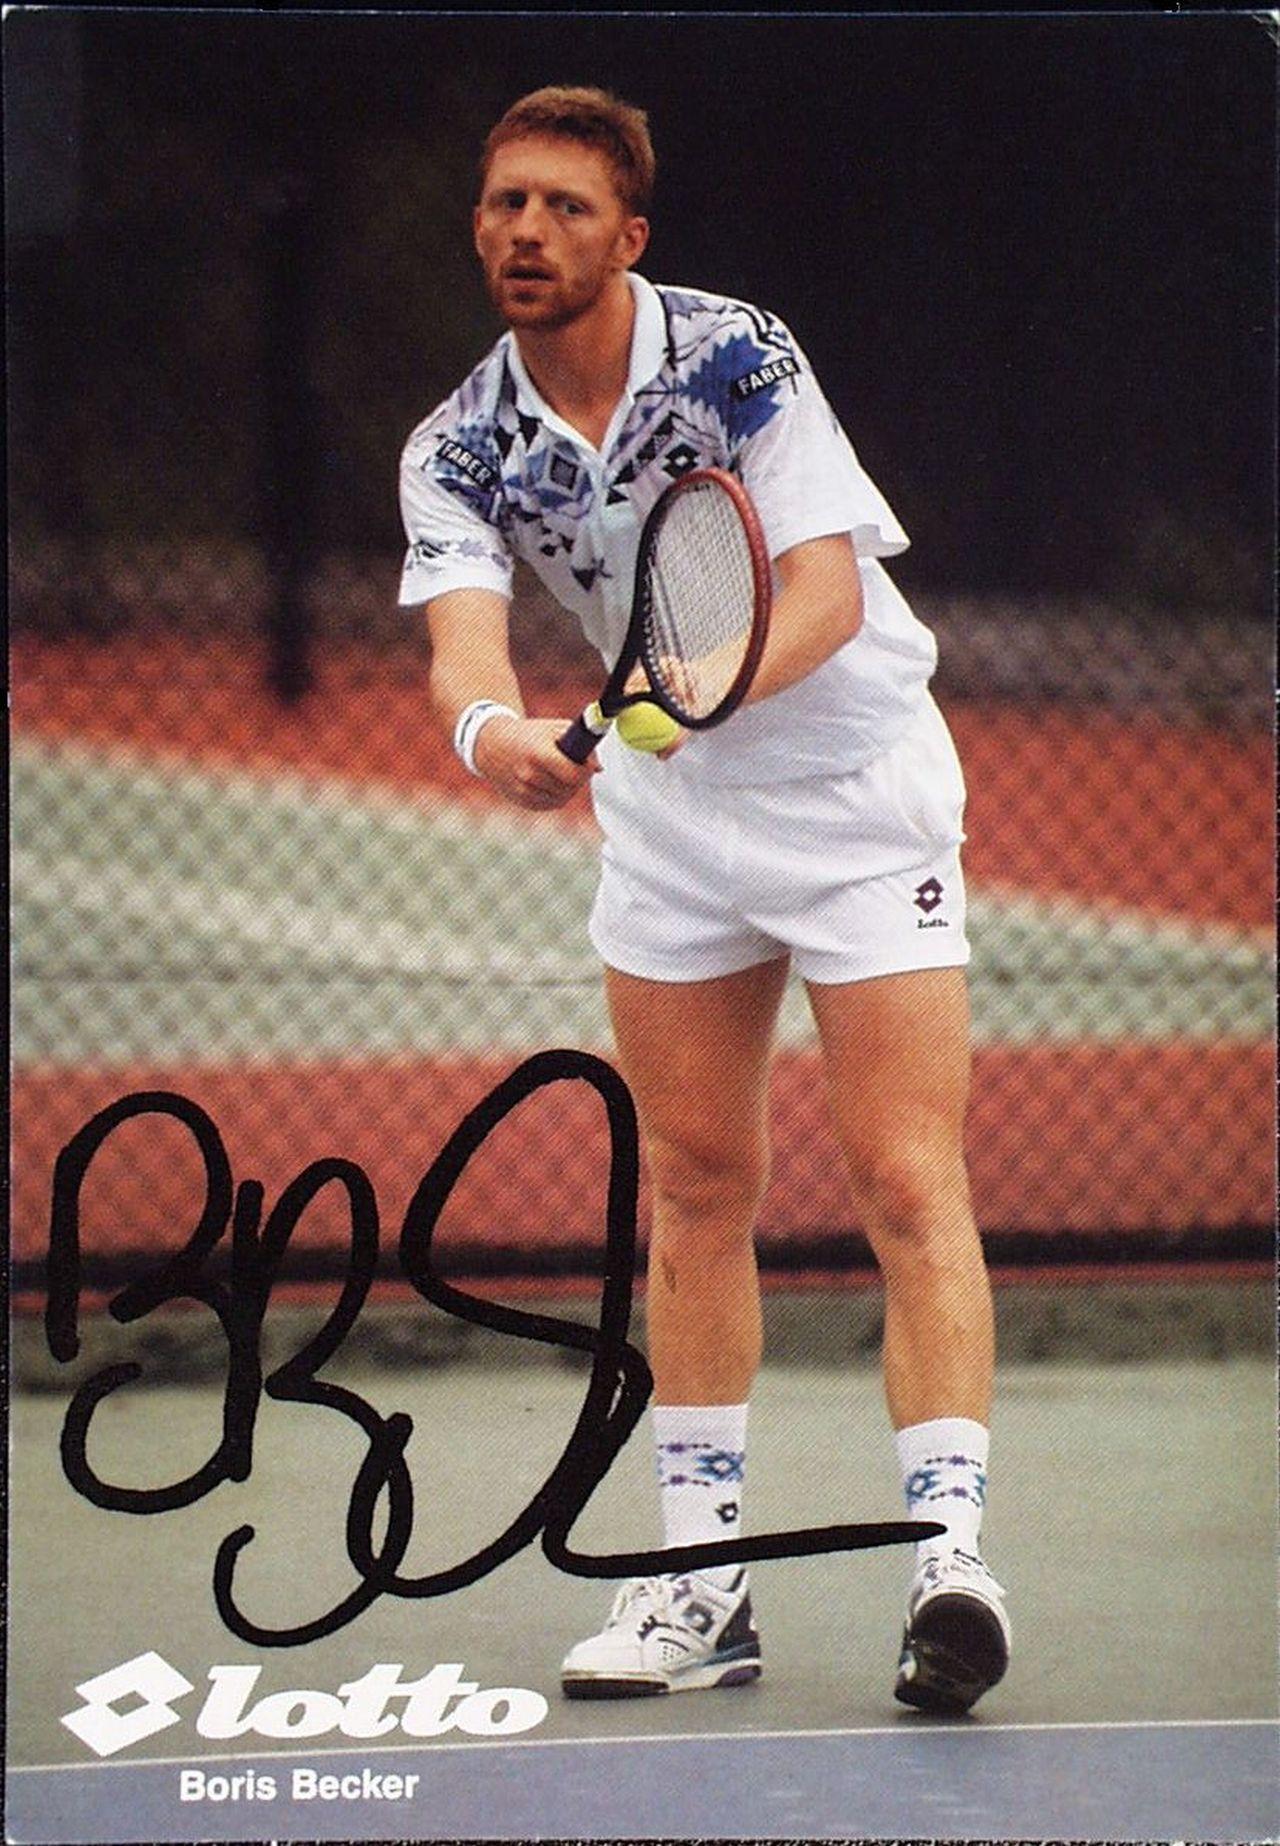 LeMO-Objekt: Autogrammkarte von Boris Becker